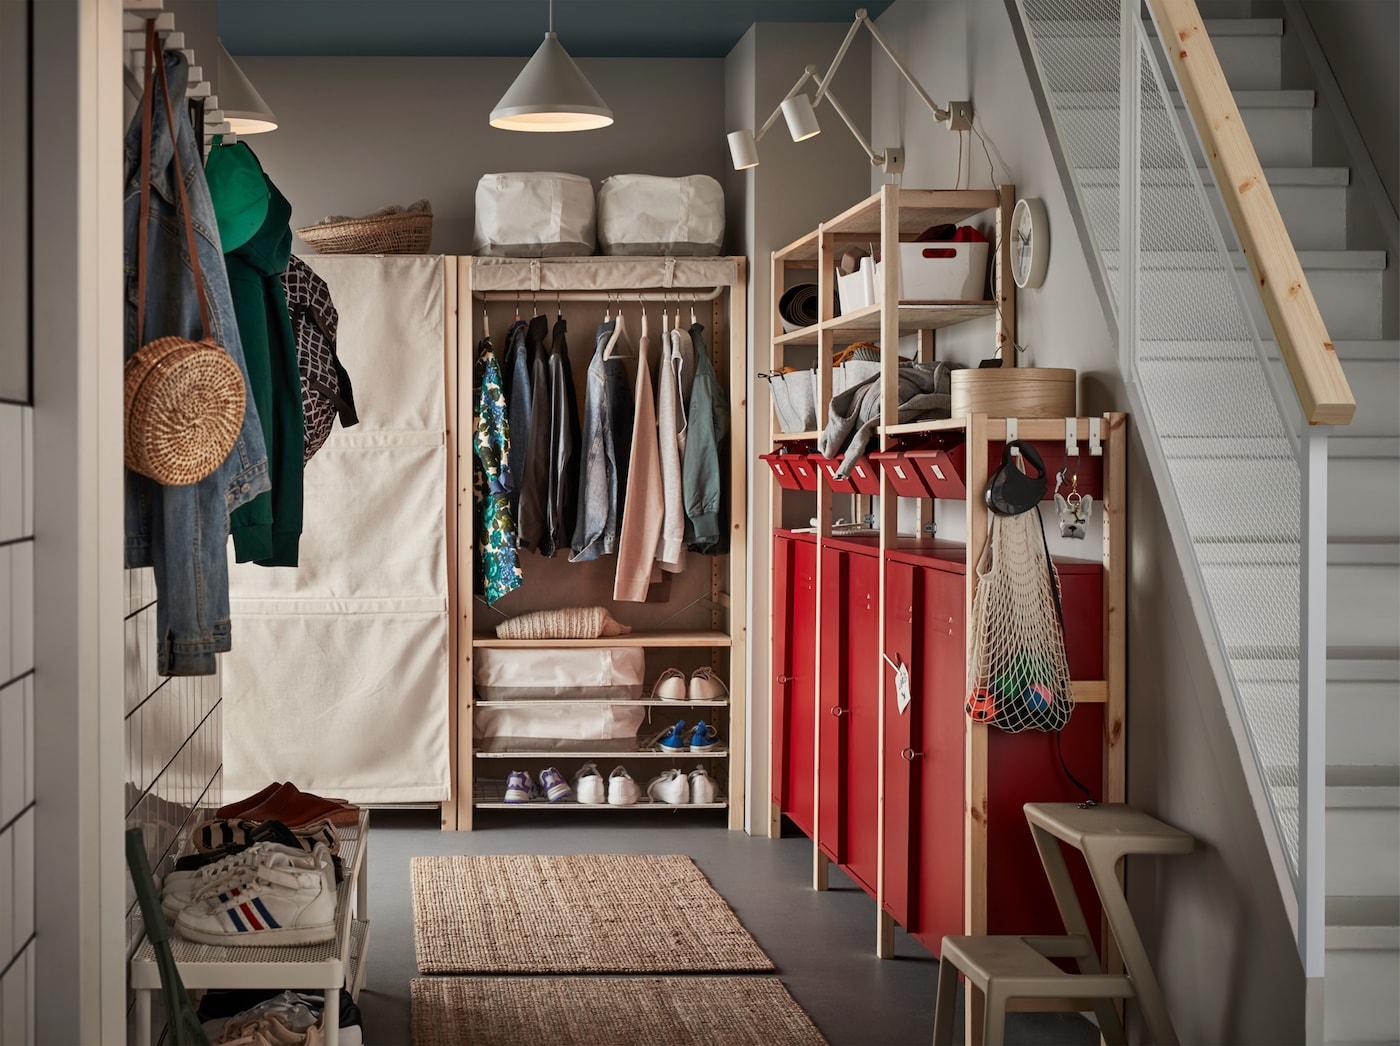 amplio colorido espacio IKEA recibidor con Un QxerWdCBo